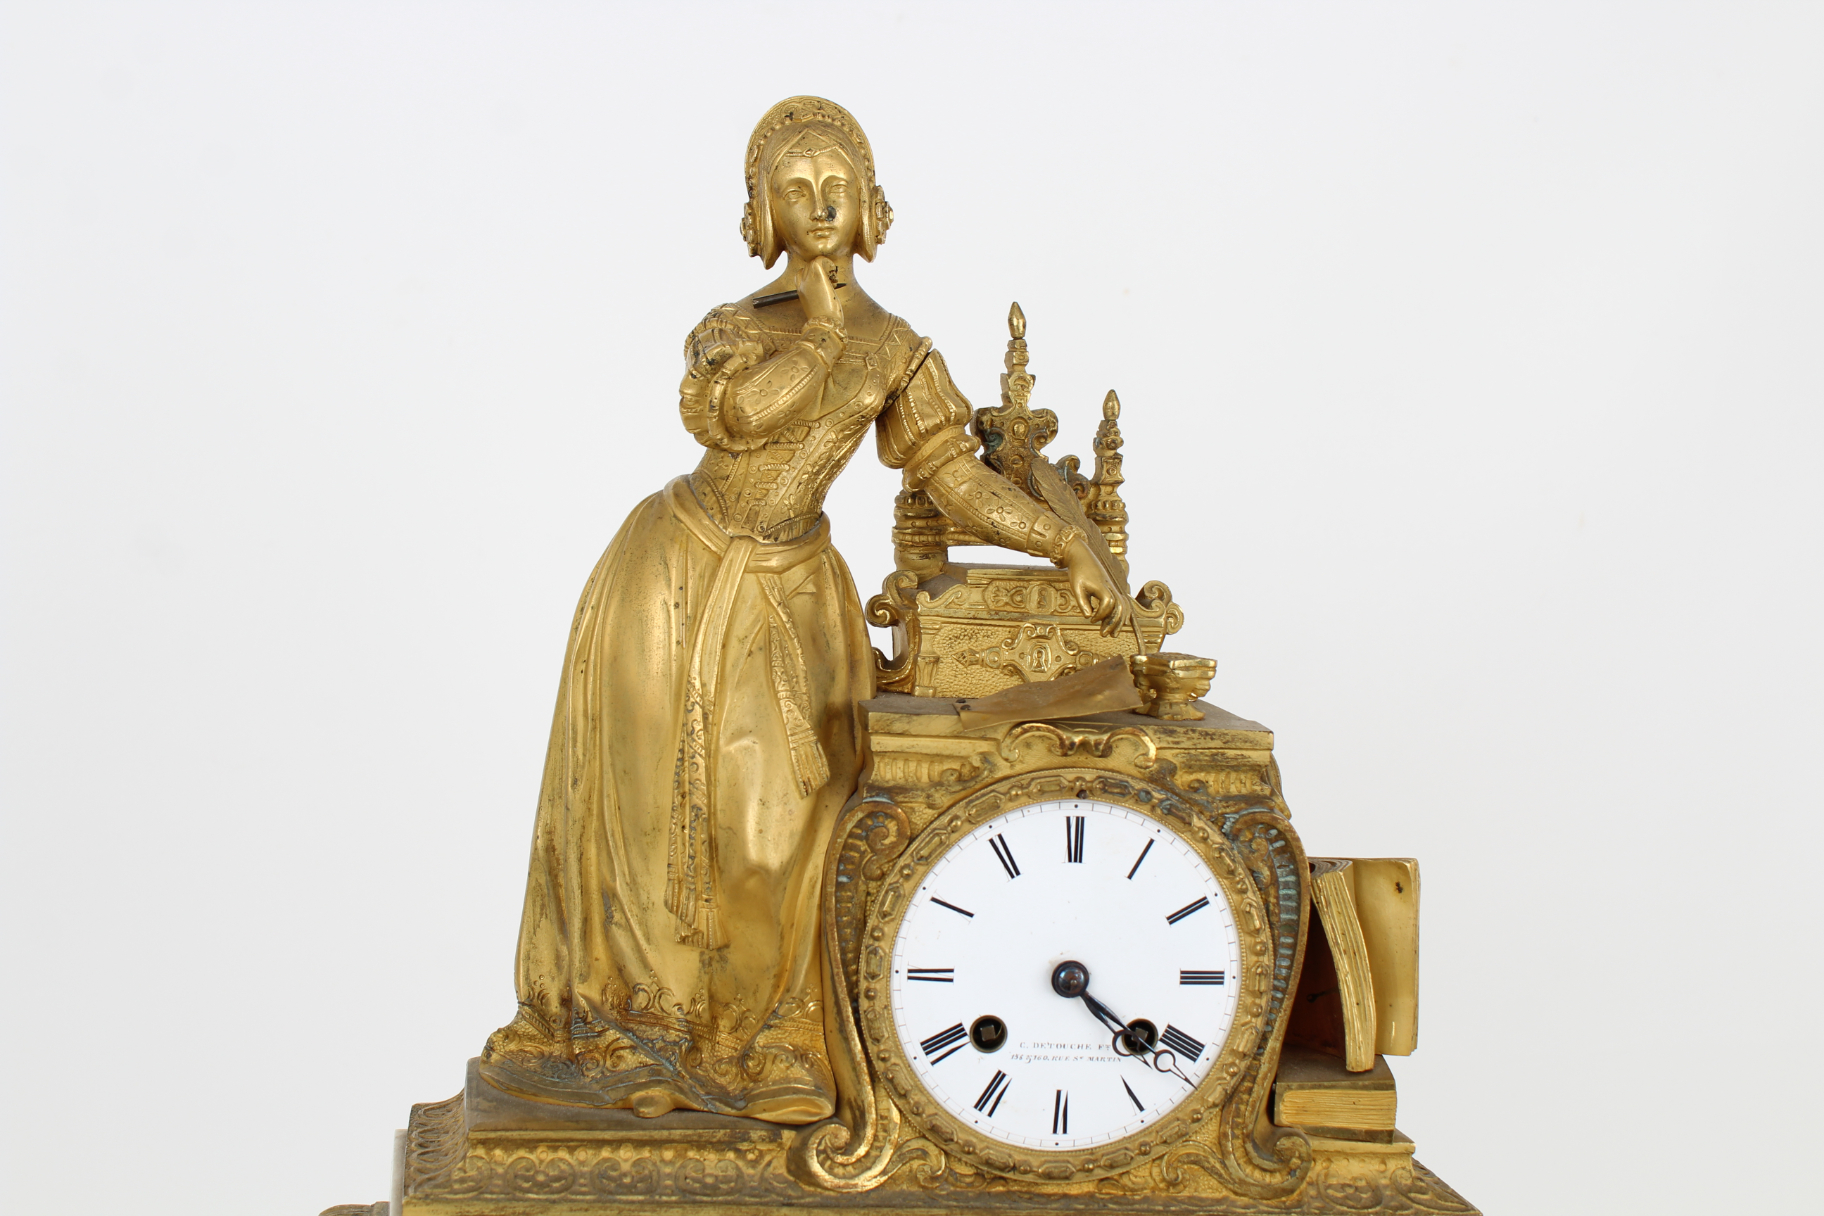 Antique Gilt Bronze French Mantel Clock - Image 3 of 5